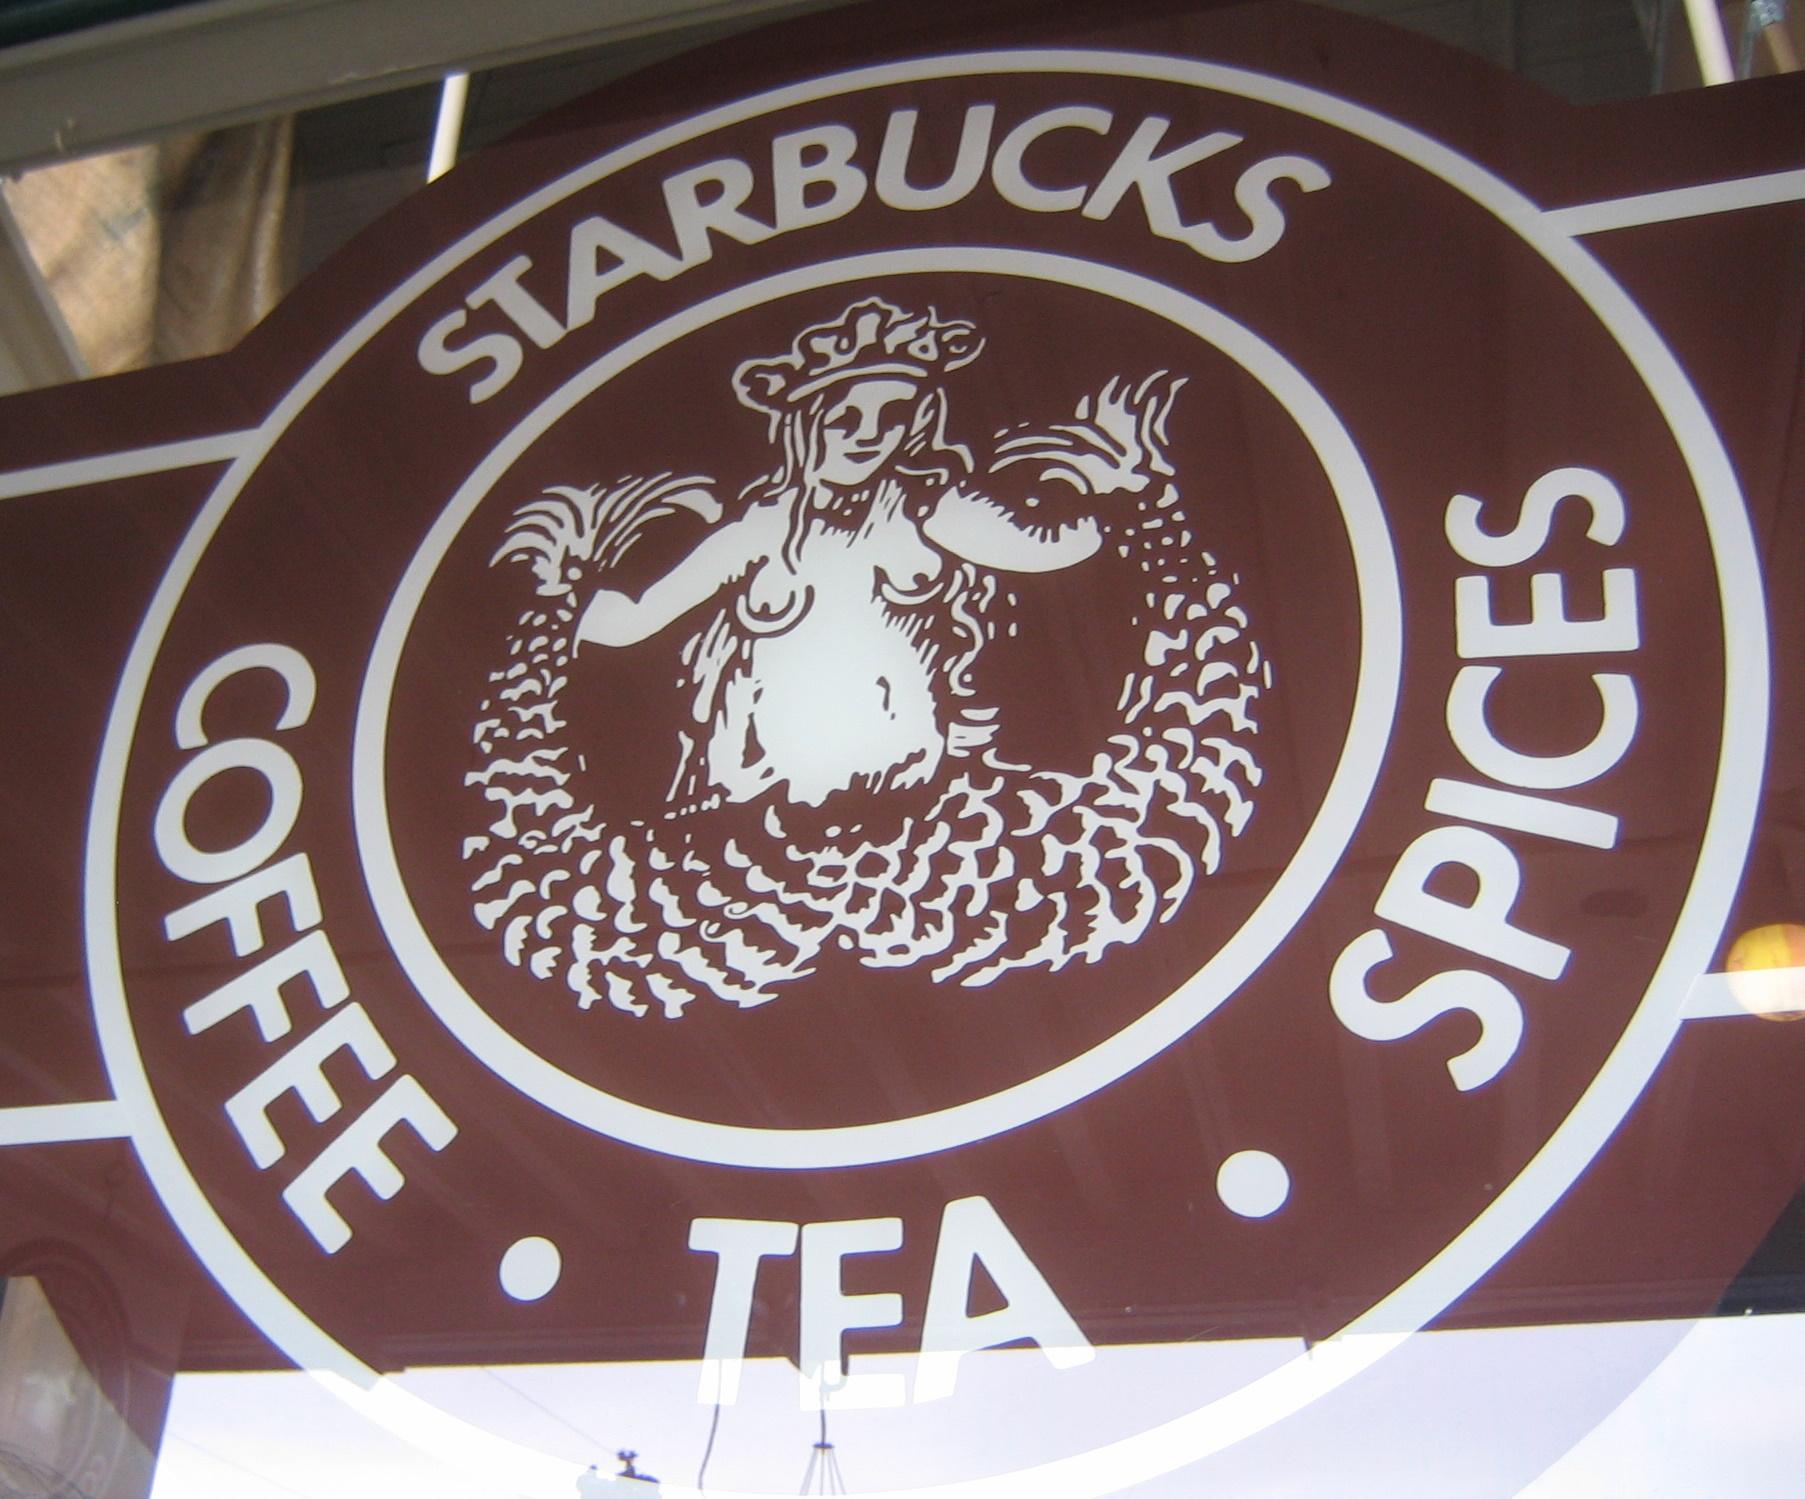 the old starbucks logo | Flickr - Photo Sharing!